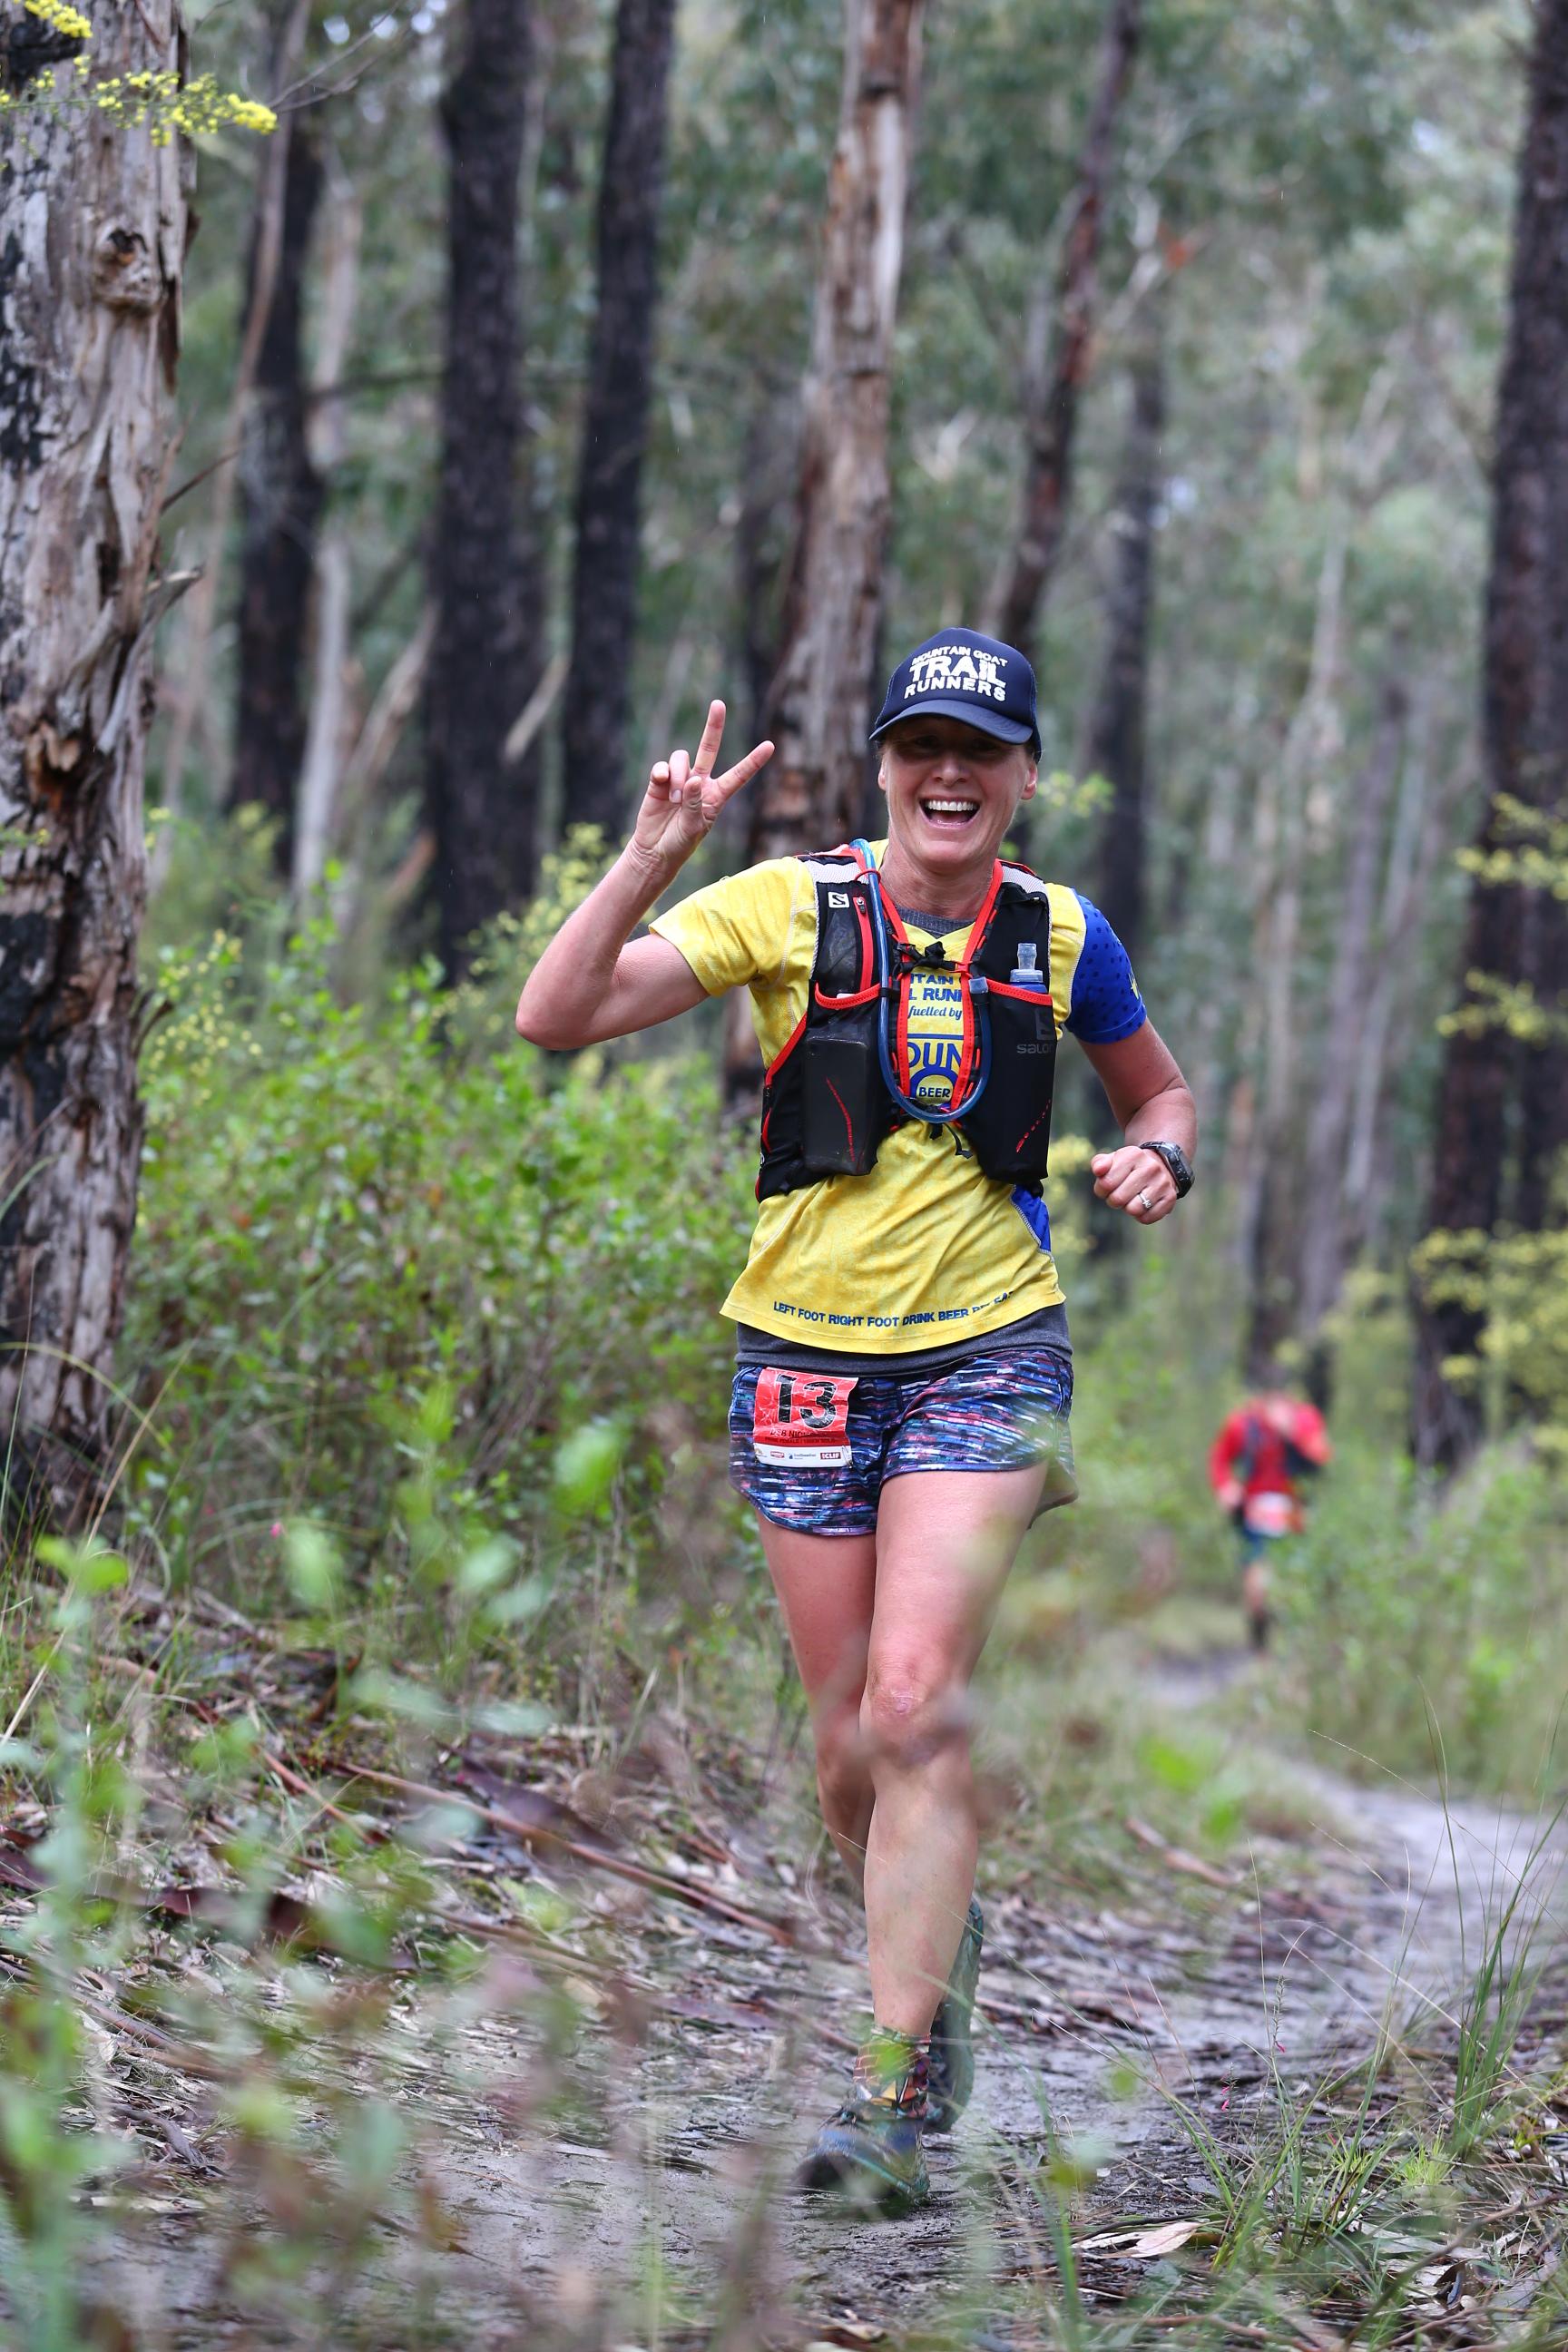 Deb Nicholl 100km champion